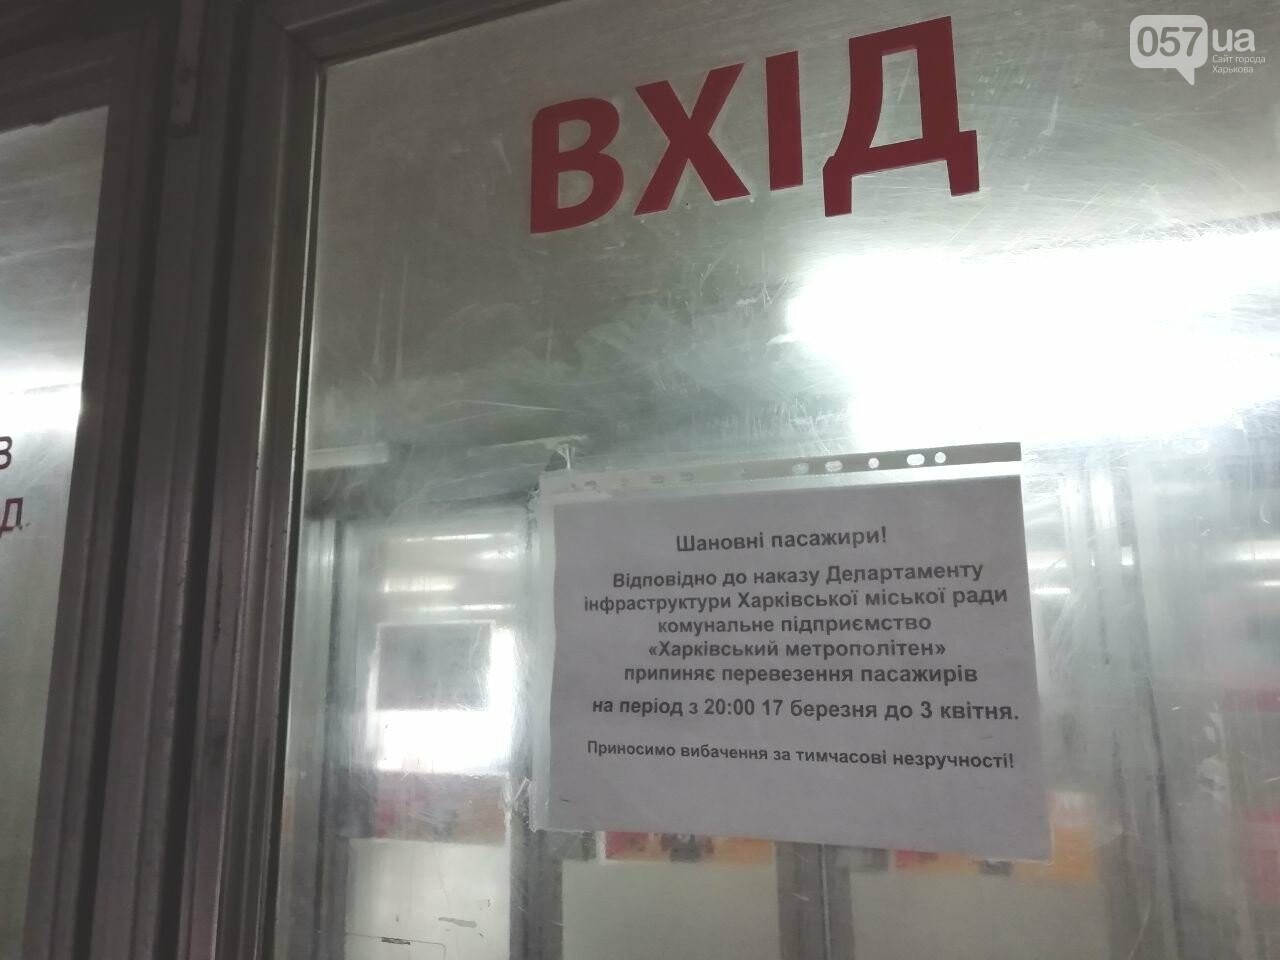 Безлюдный вокзал и дезинфекция трамваев: как живет ЮЖД во время карантина, - ФОТО, фото-8